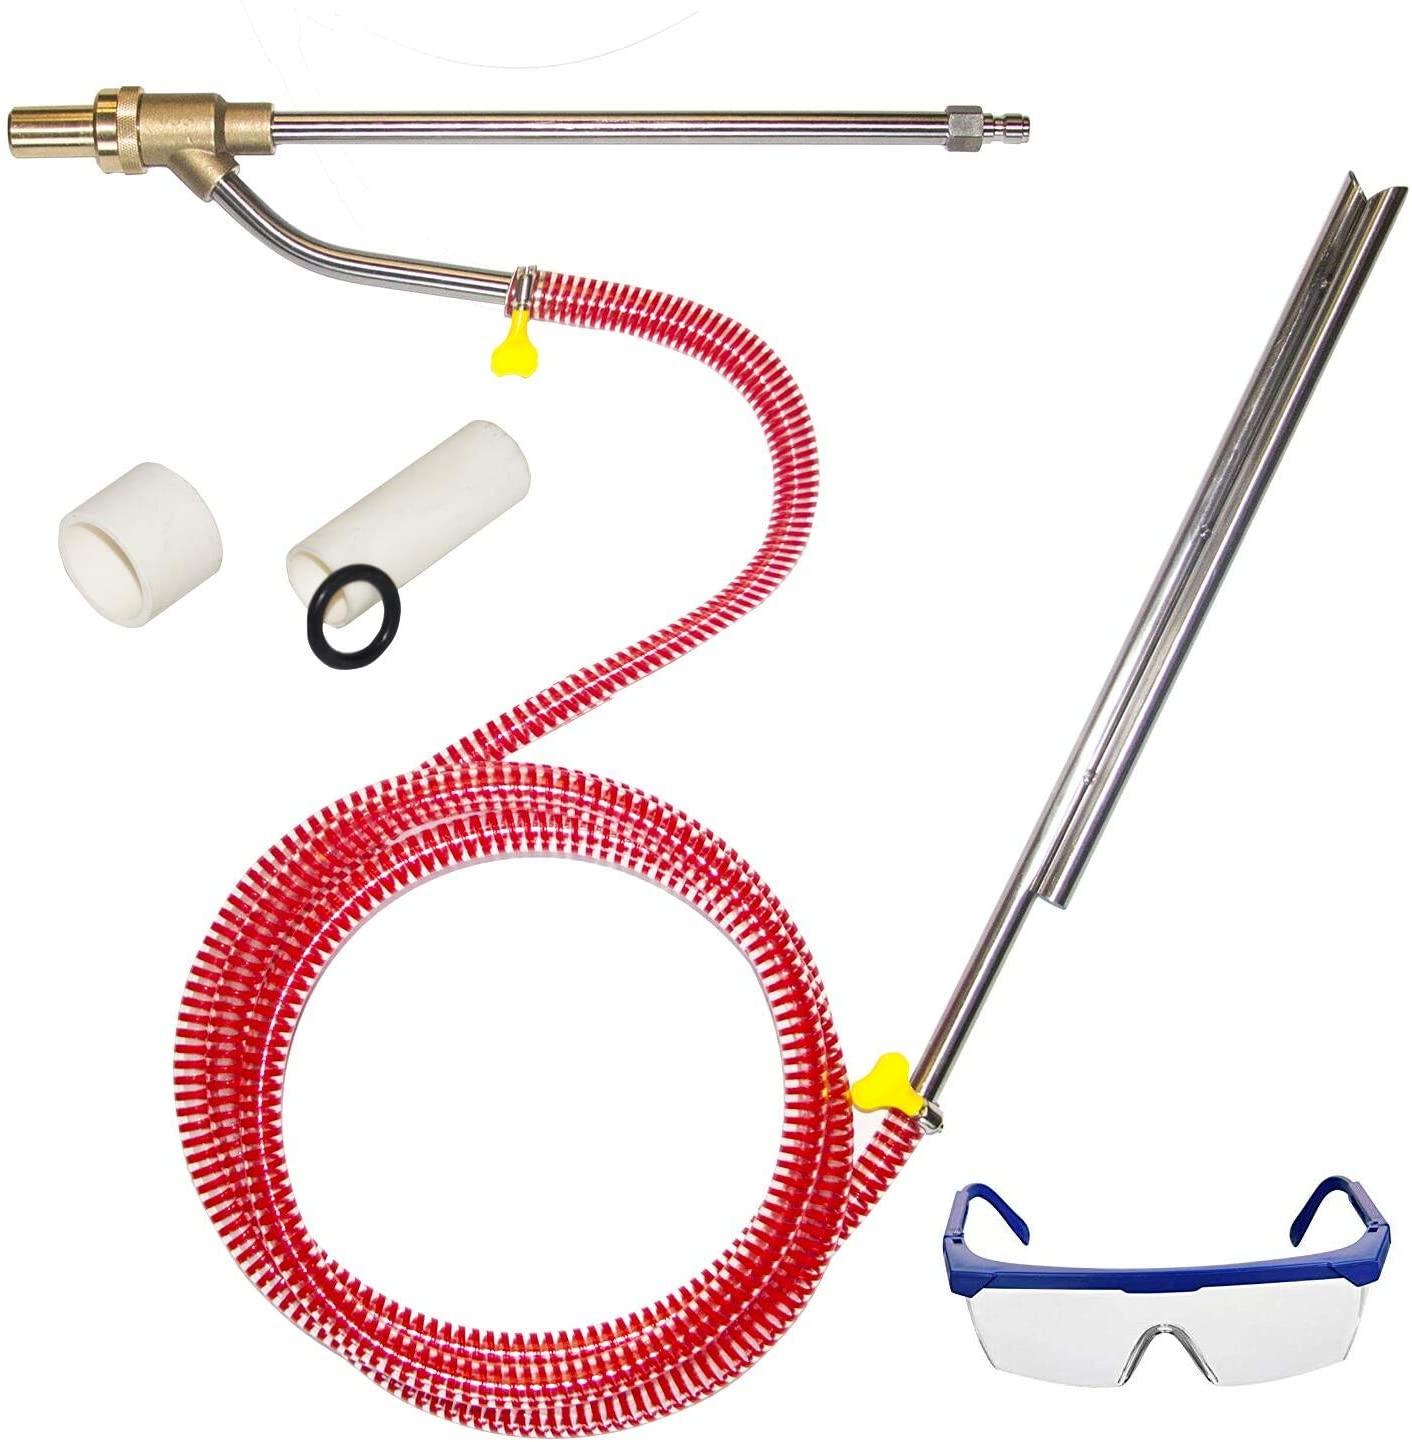 Hourleey Pressure Washer Sandblasting Kit, Dustless Sand Blasting Kit Wet Sandblaster Attachment, 1/4 Inch Quick Disconnect, 5000 PSI